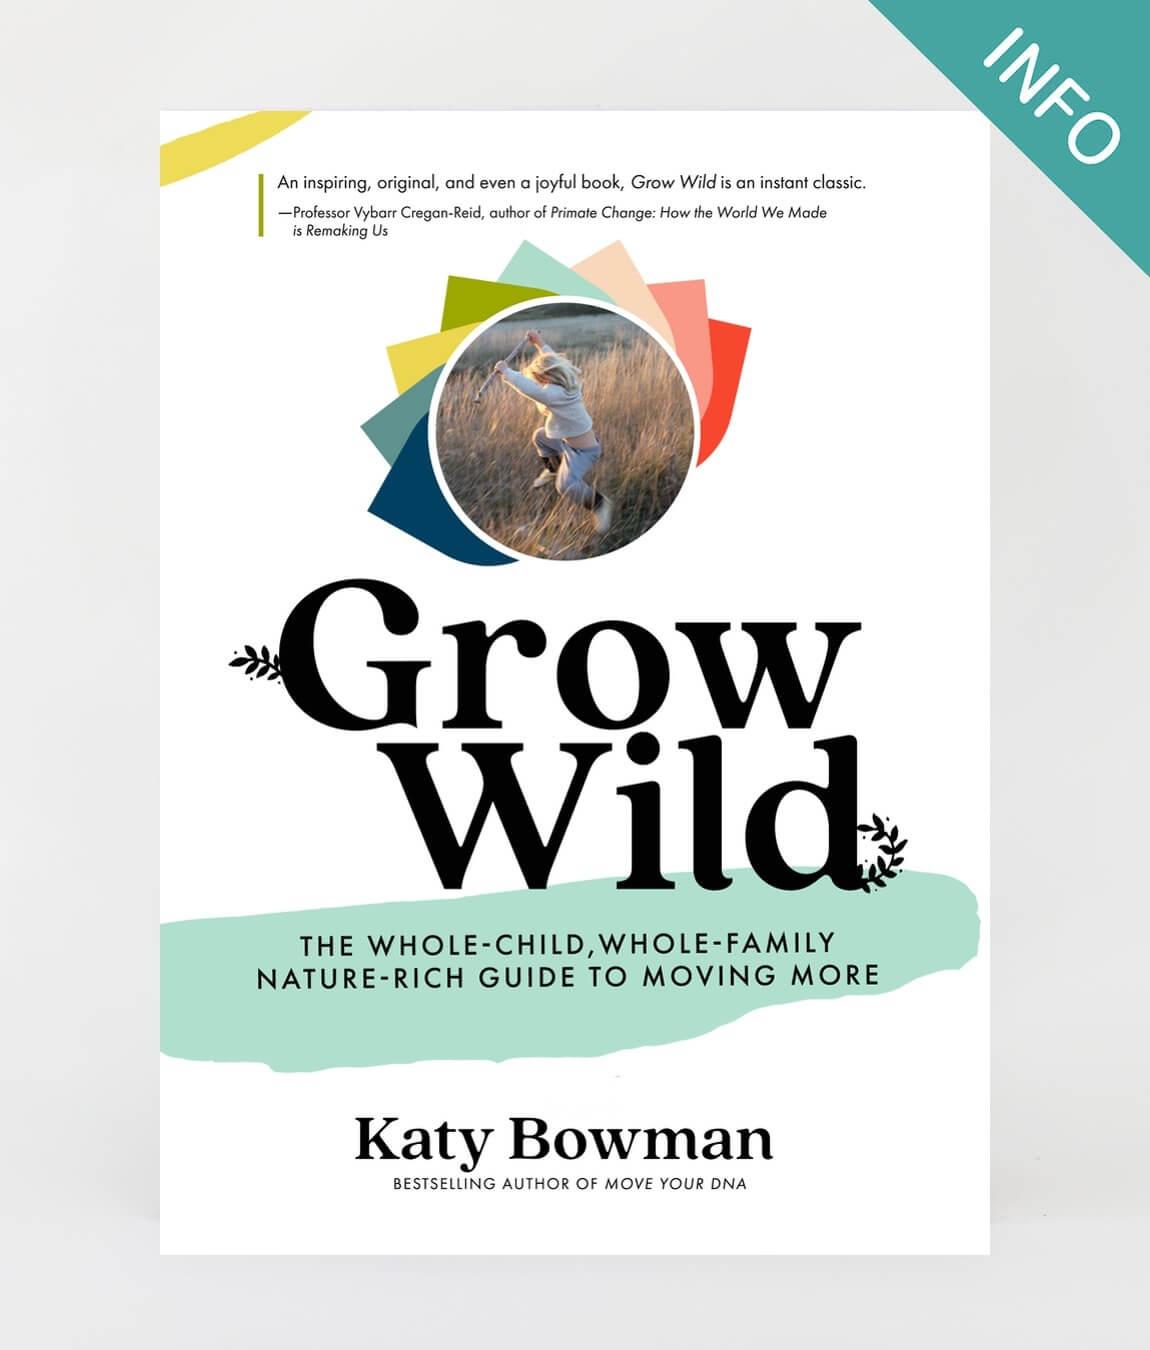 Grow Wild Katy Bowman